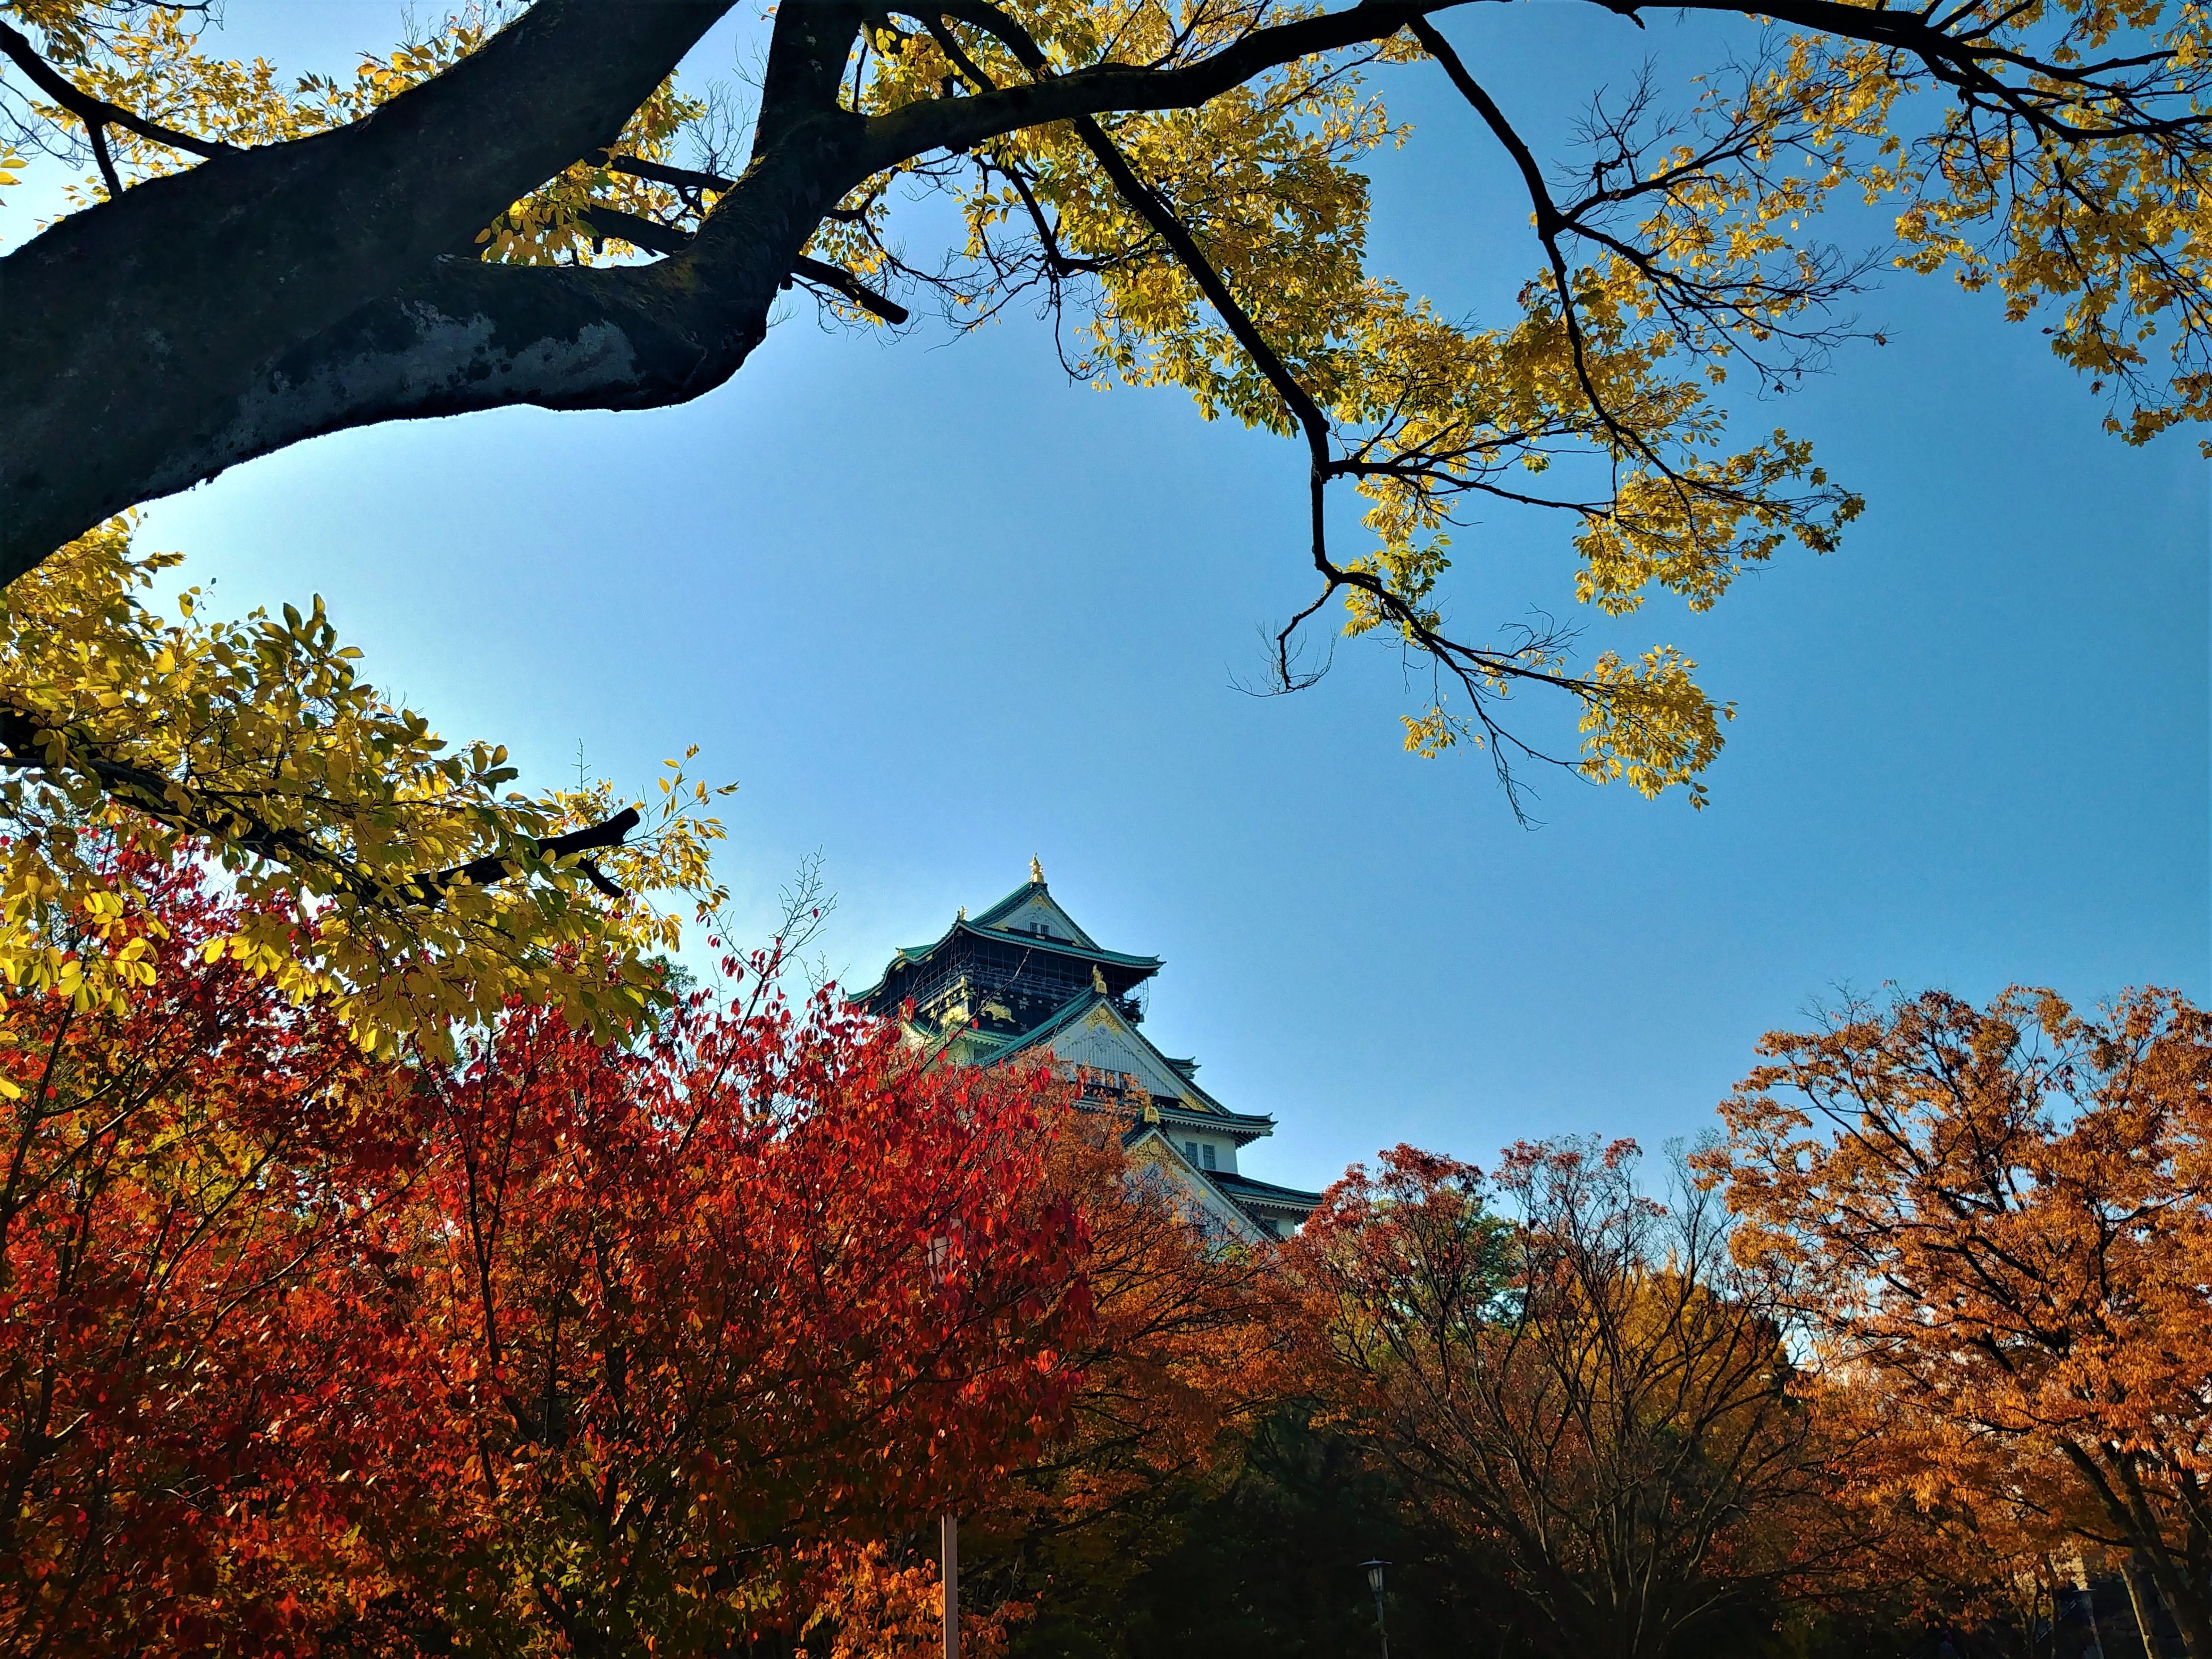 Osaka momiji automne chateau asie arpenter le chemin blog voyage